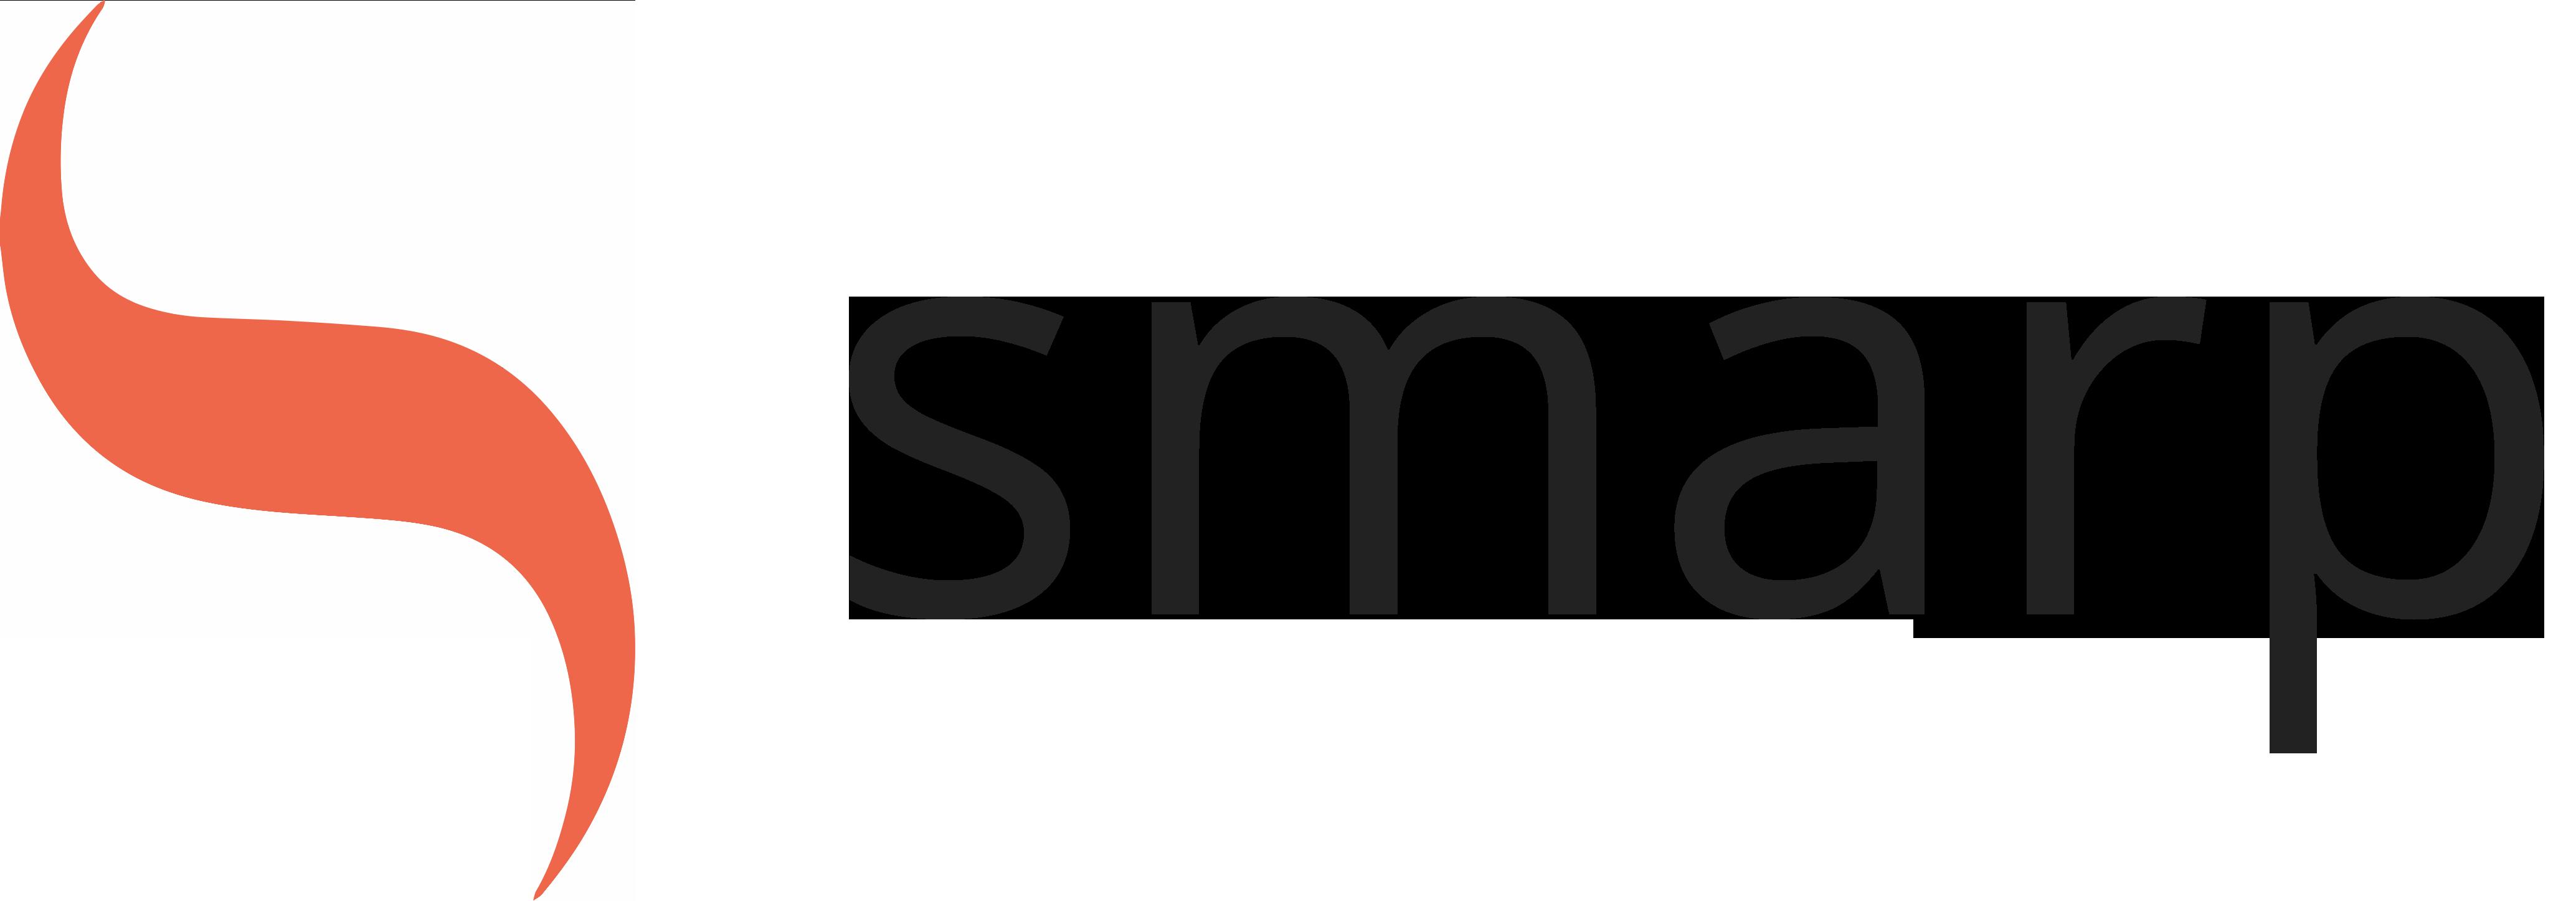 smarp-international-account-executive-helsinki-sdsuu-3222517 logo